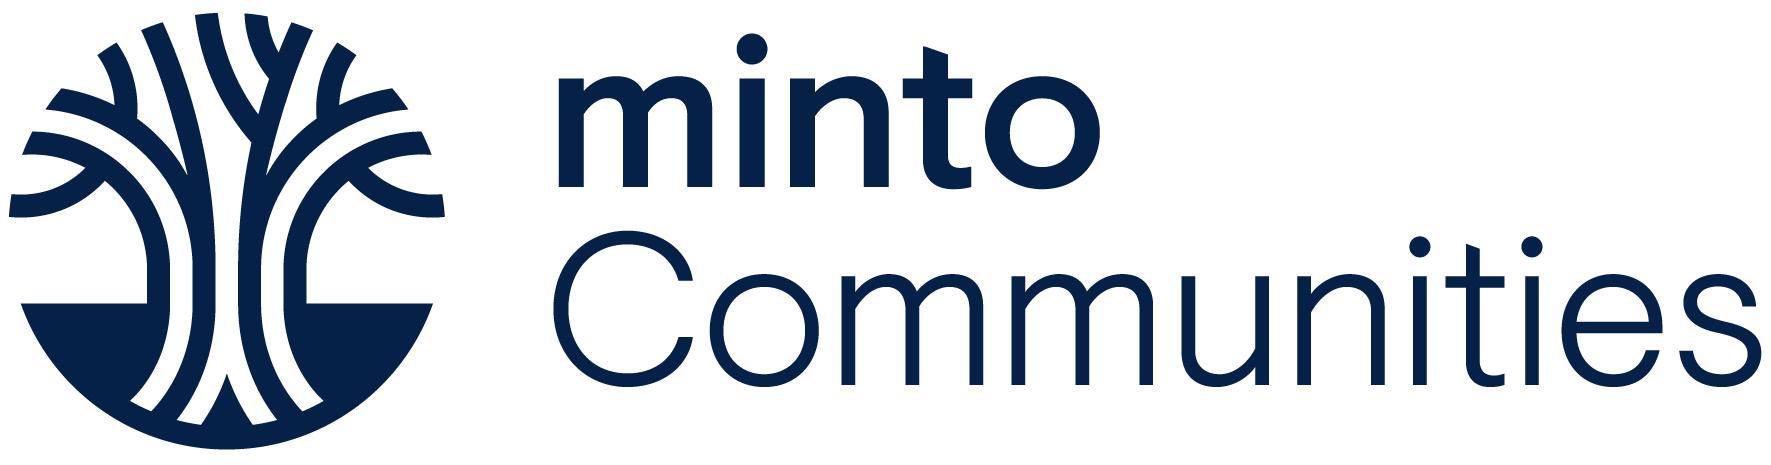 minto_communities.jpg